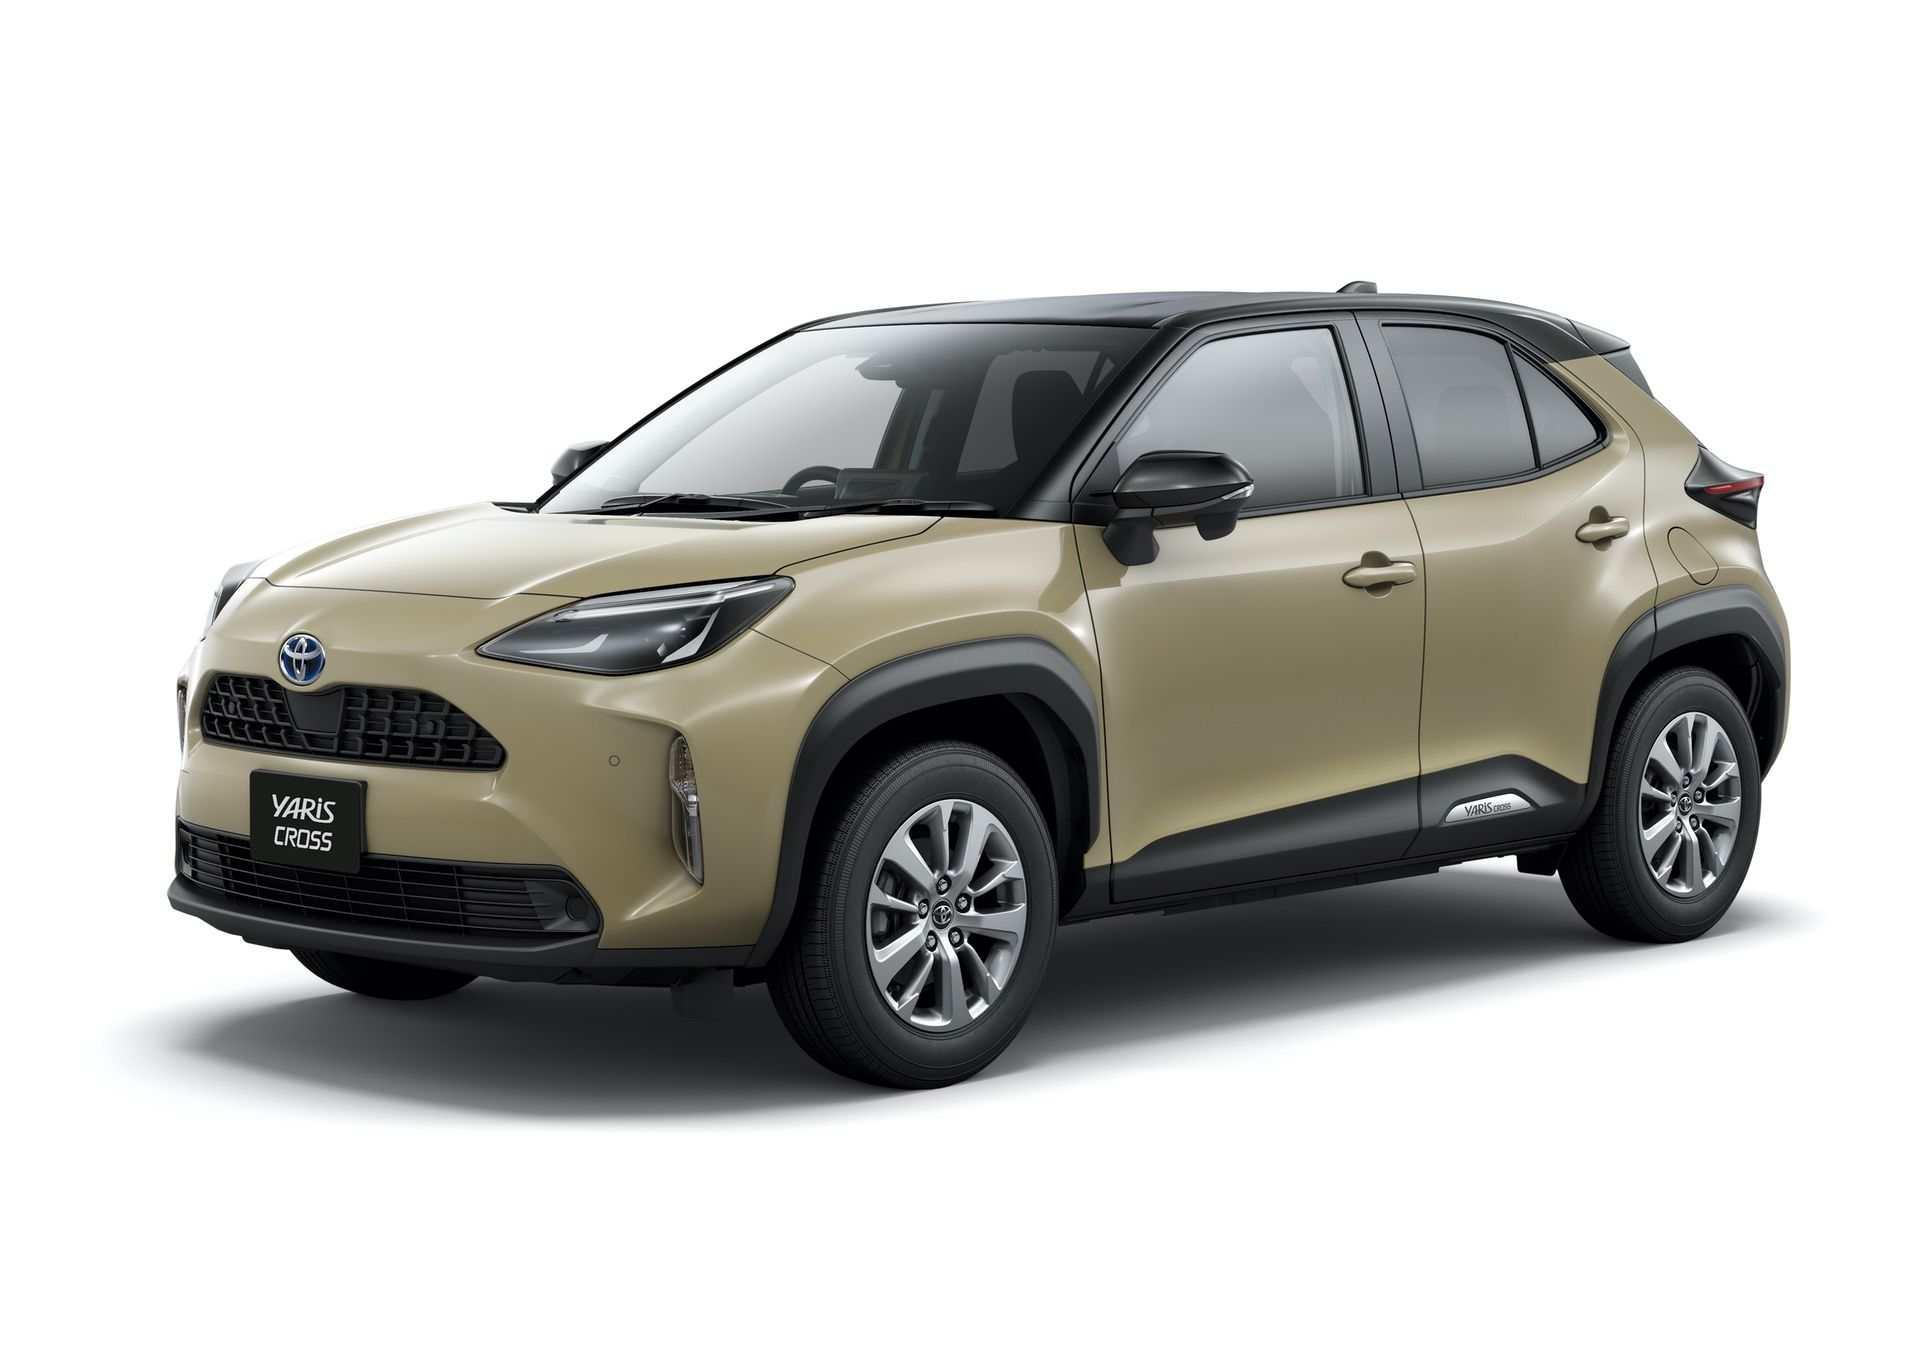 2020_Toyota_Yaris_Cross_JDM_0006